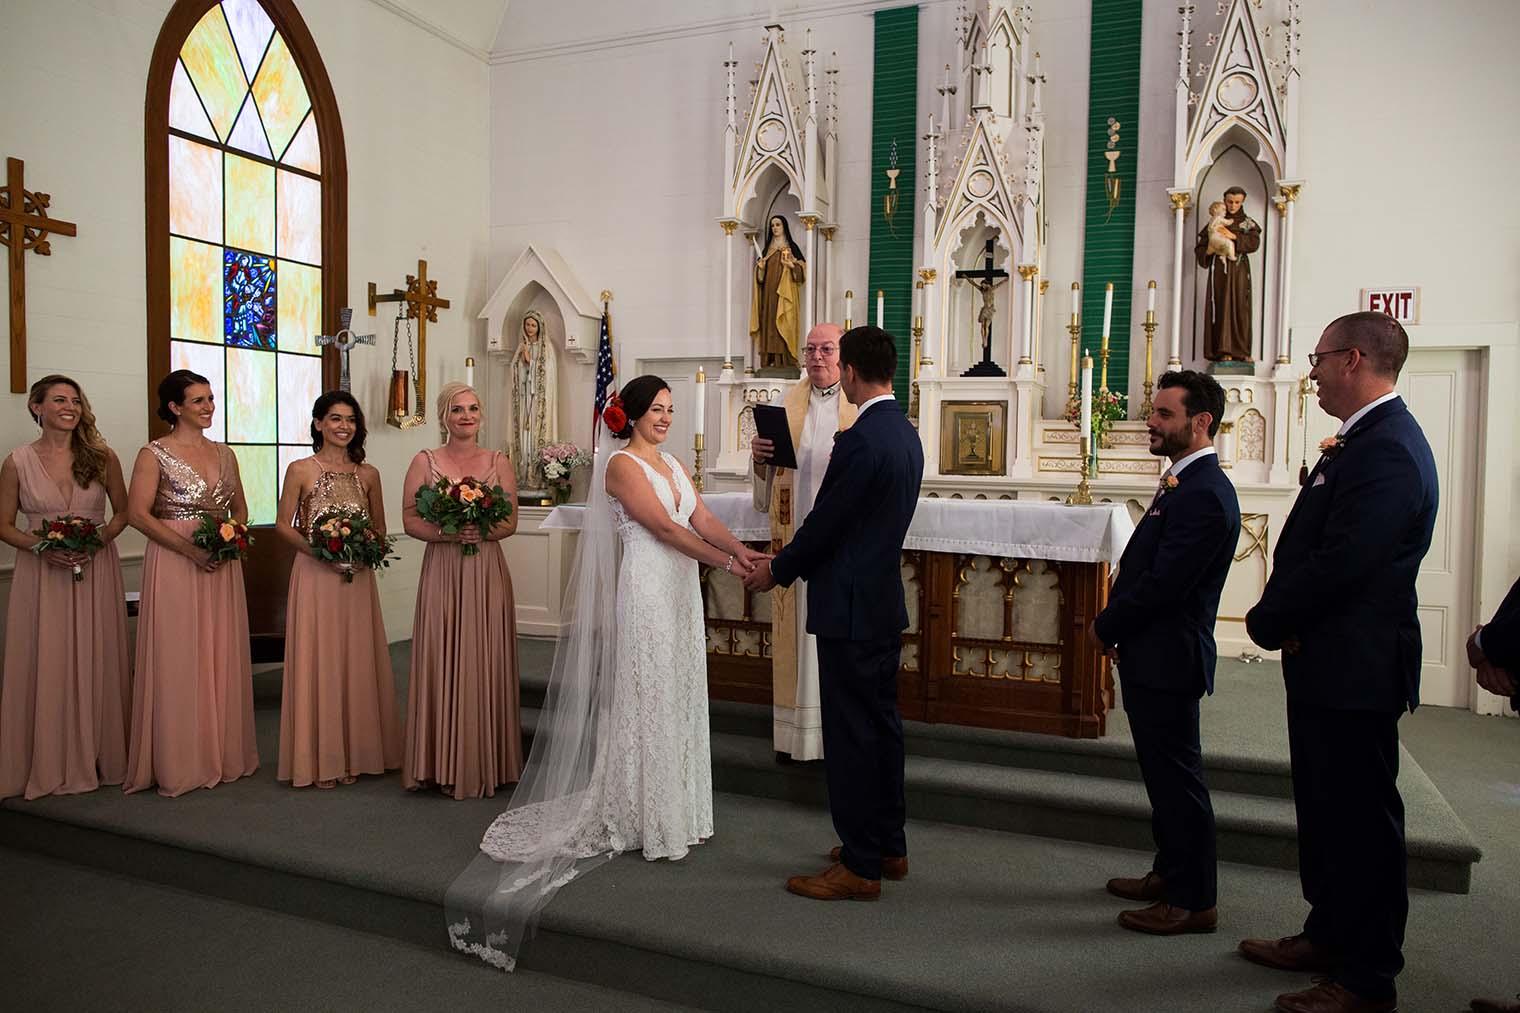 wedding ceremony at Saint Teresa of Avila Church